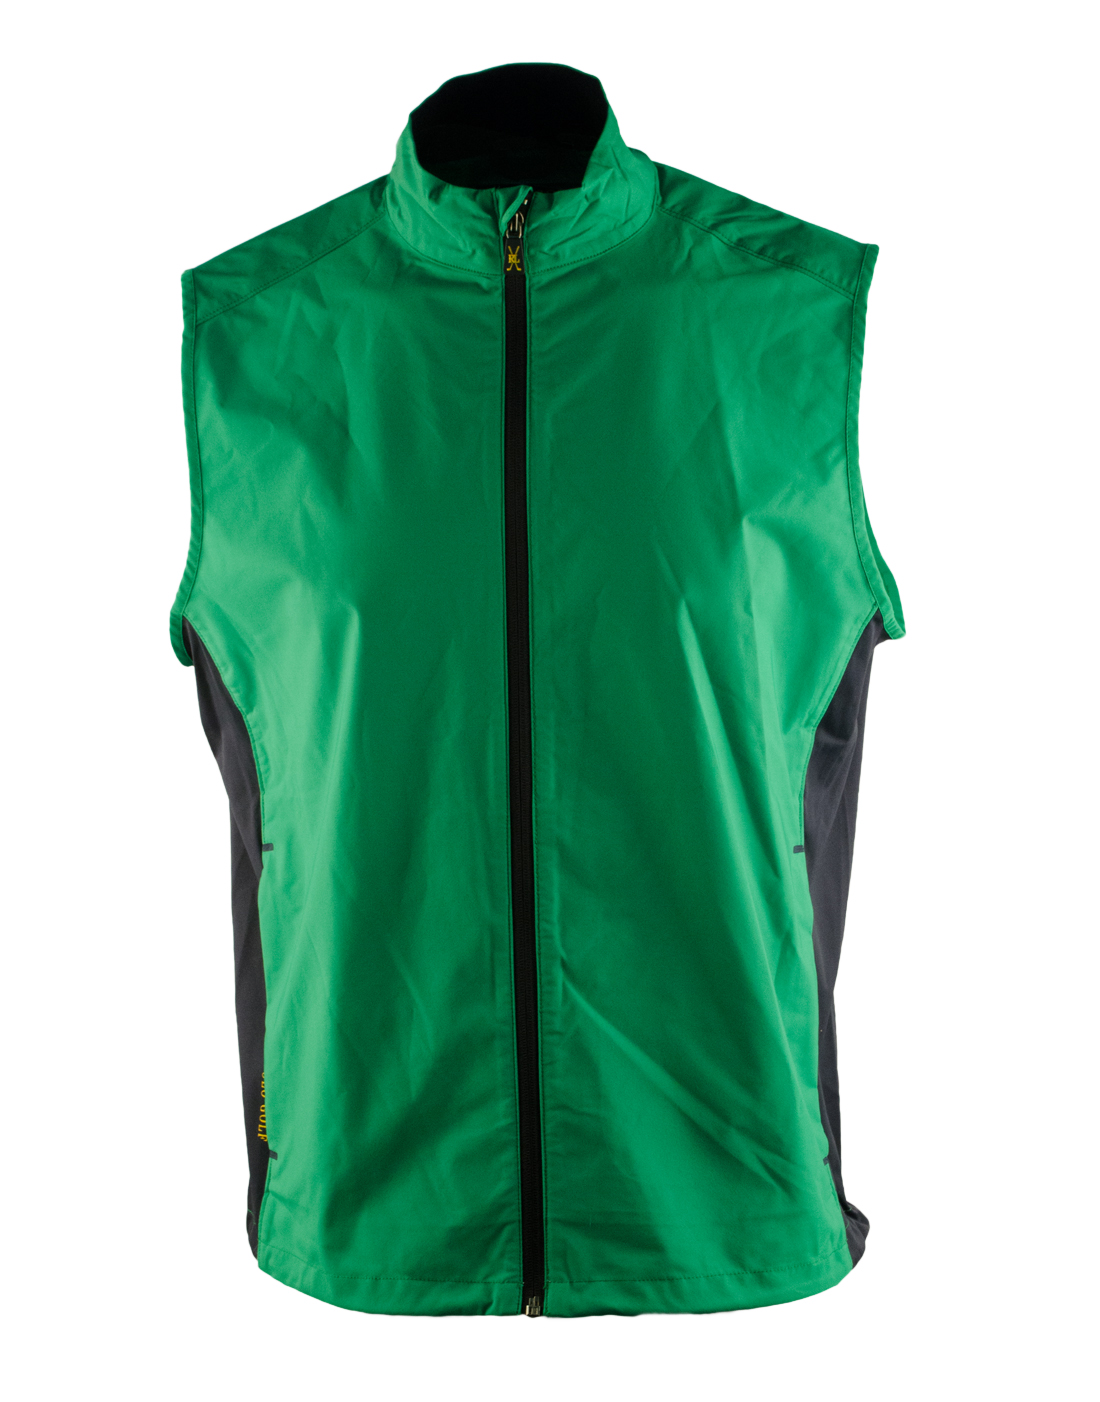 Polo Sport Ralph Lauren French Navy Sleeveless Tee Shirt Mens Nwt